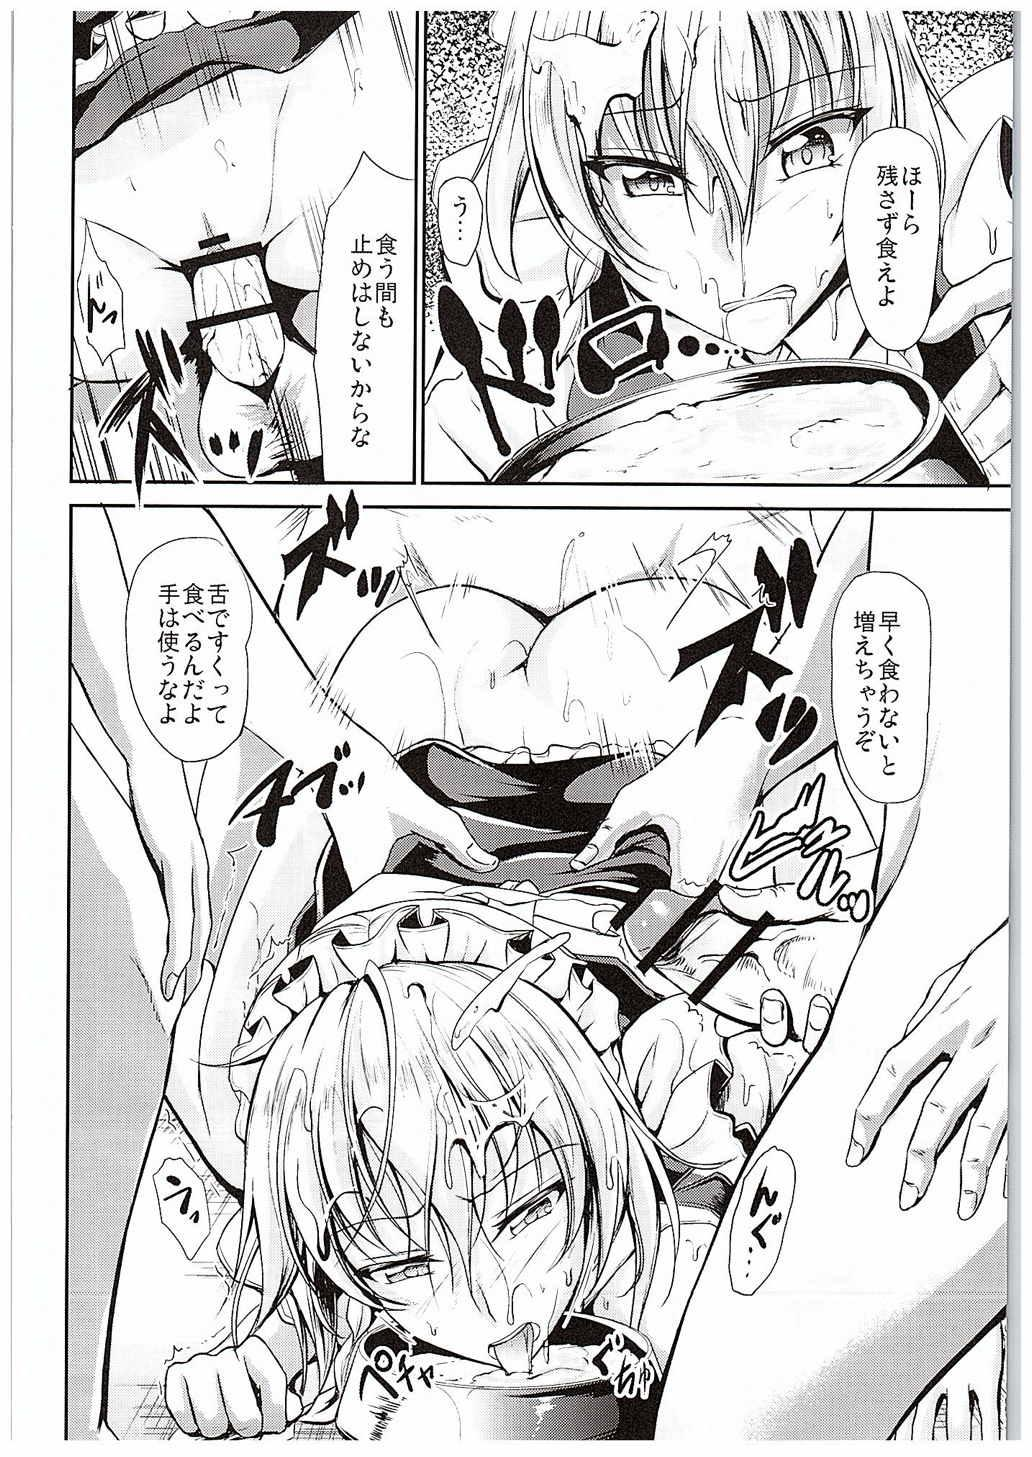 Koumakan no Rental Maid Shoku 2